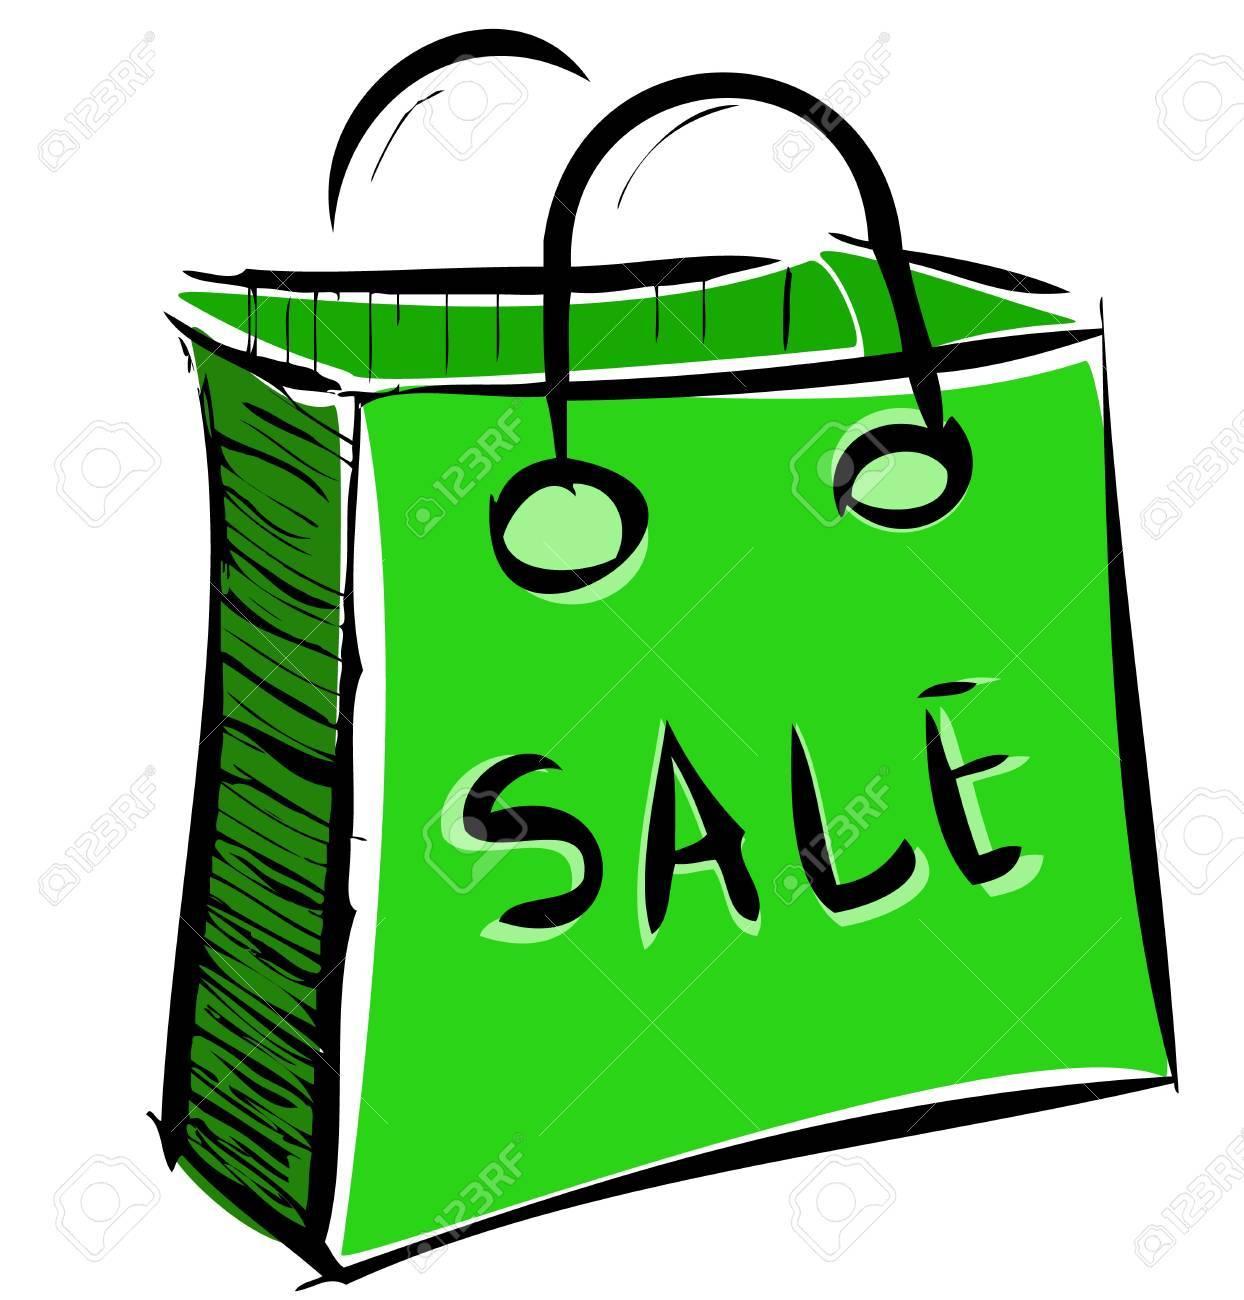 Sale bag icon Stock Vector - 18447427